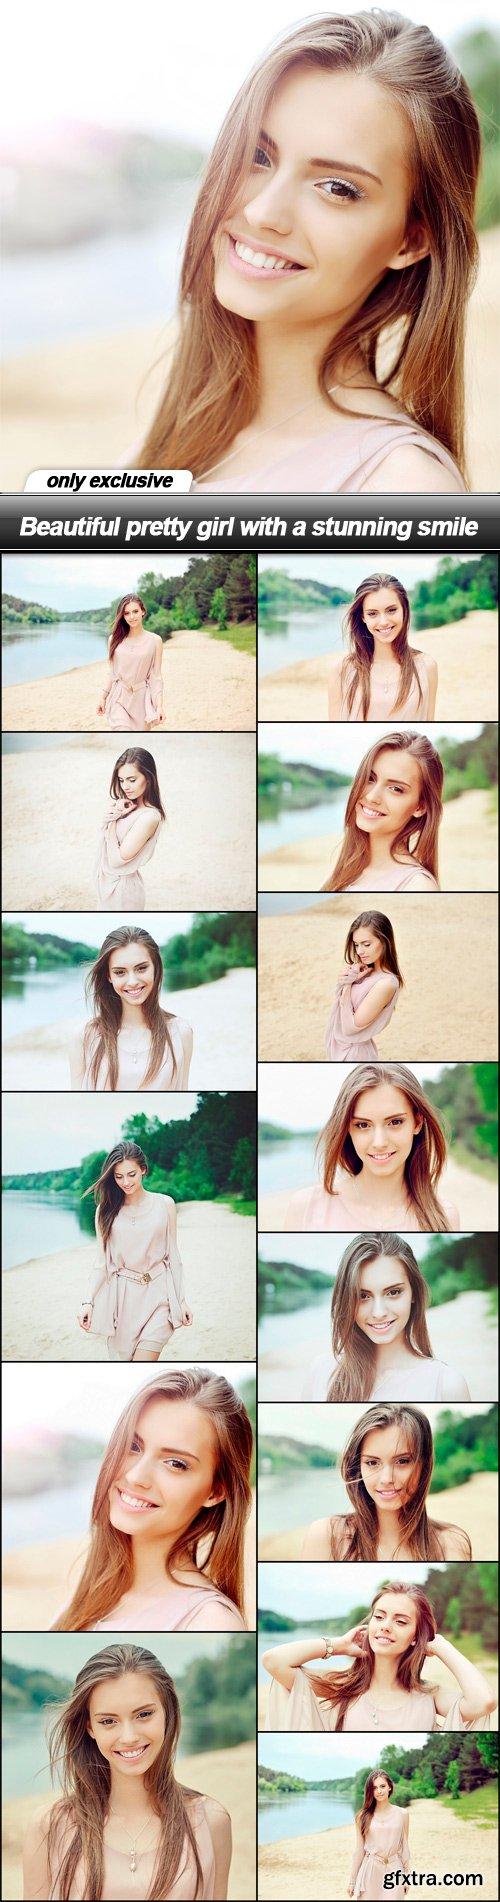 Beautiful pretty girl with a stunning smile - 14 UHQ JPEG